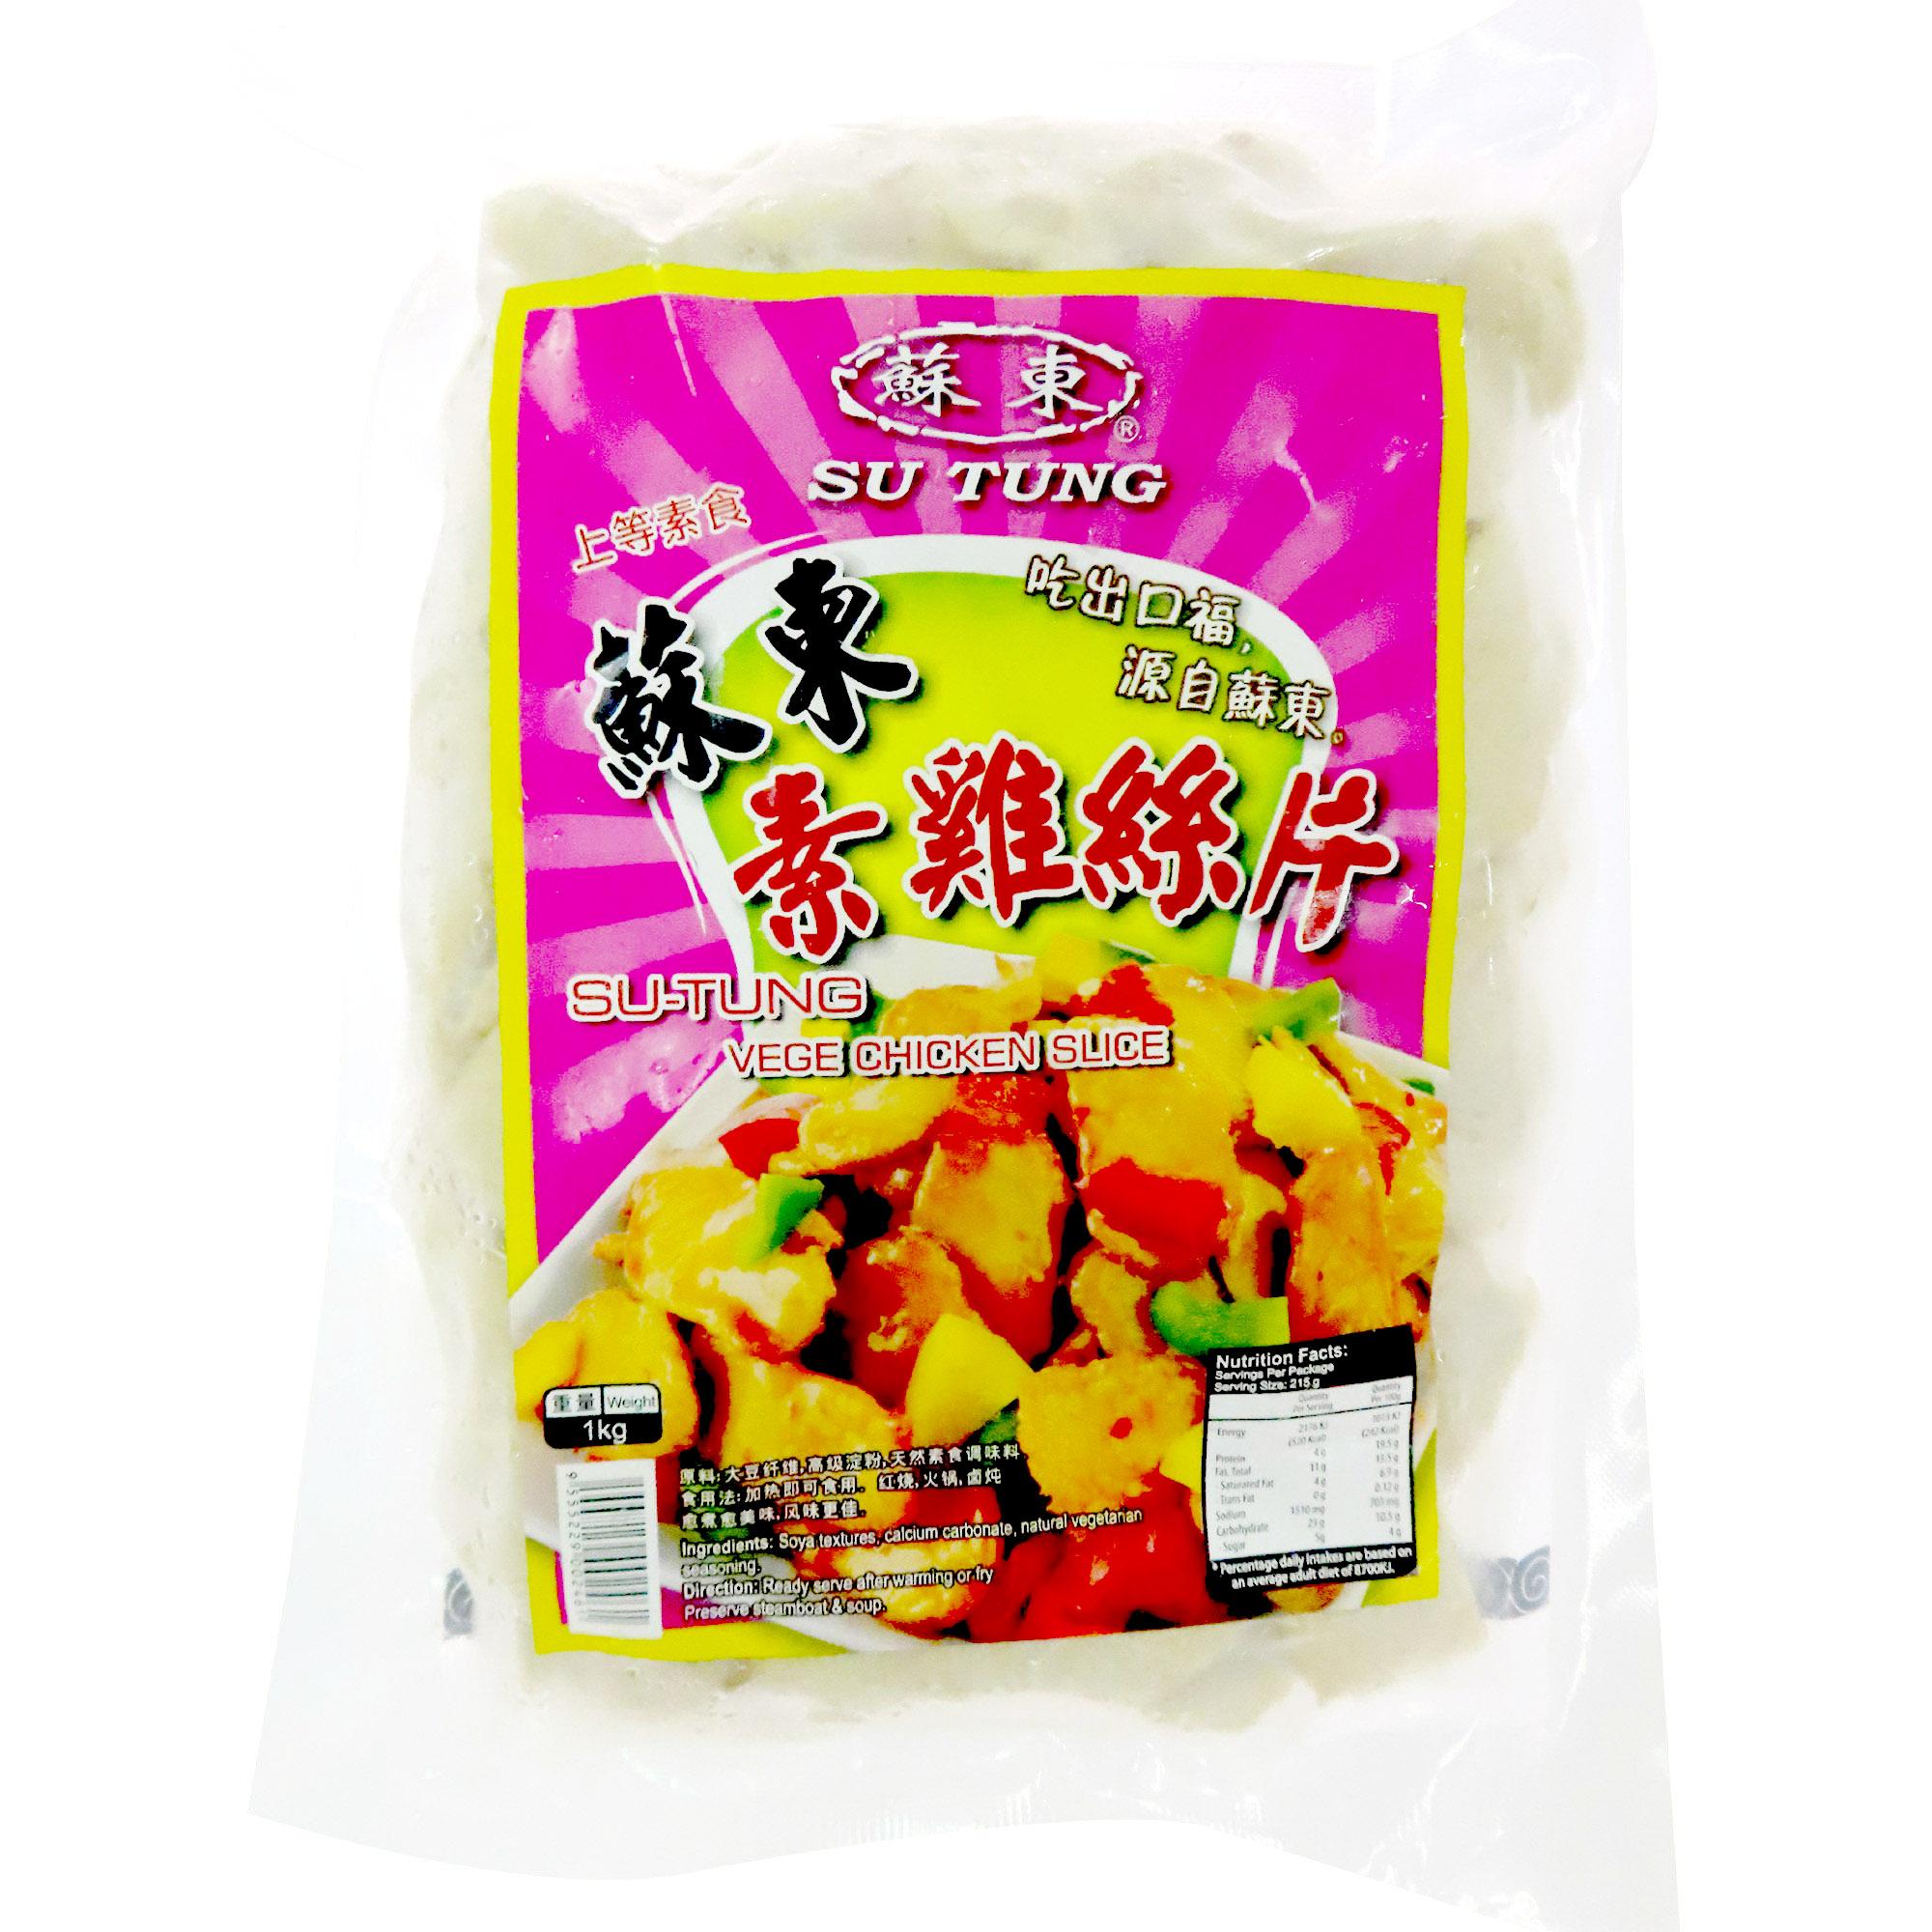 Image ST Chicken Slice 苏东 - 鸡丝片 1000grams